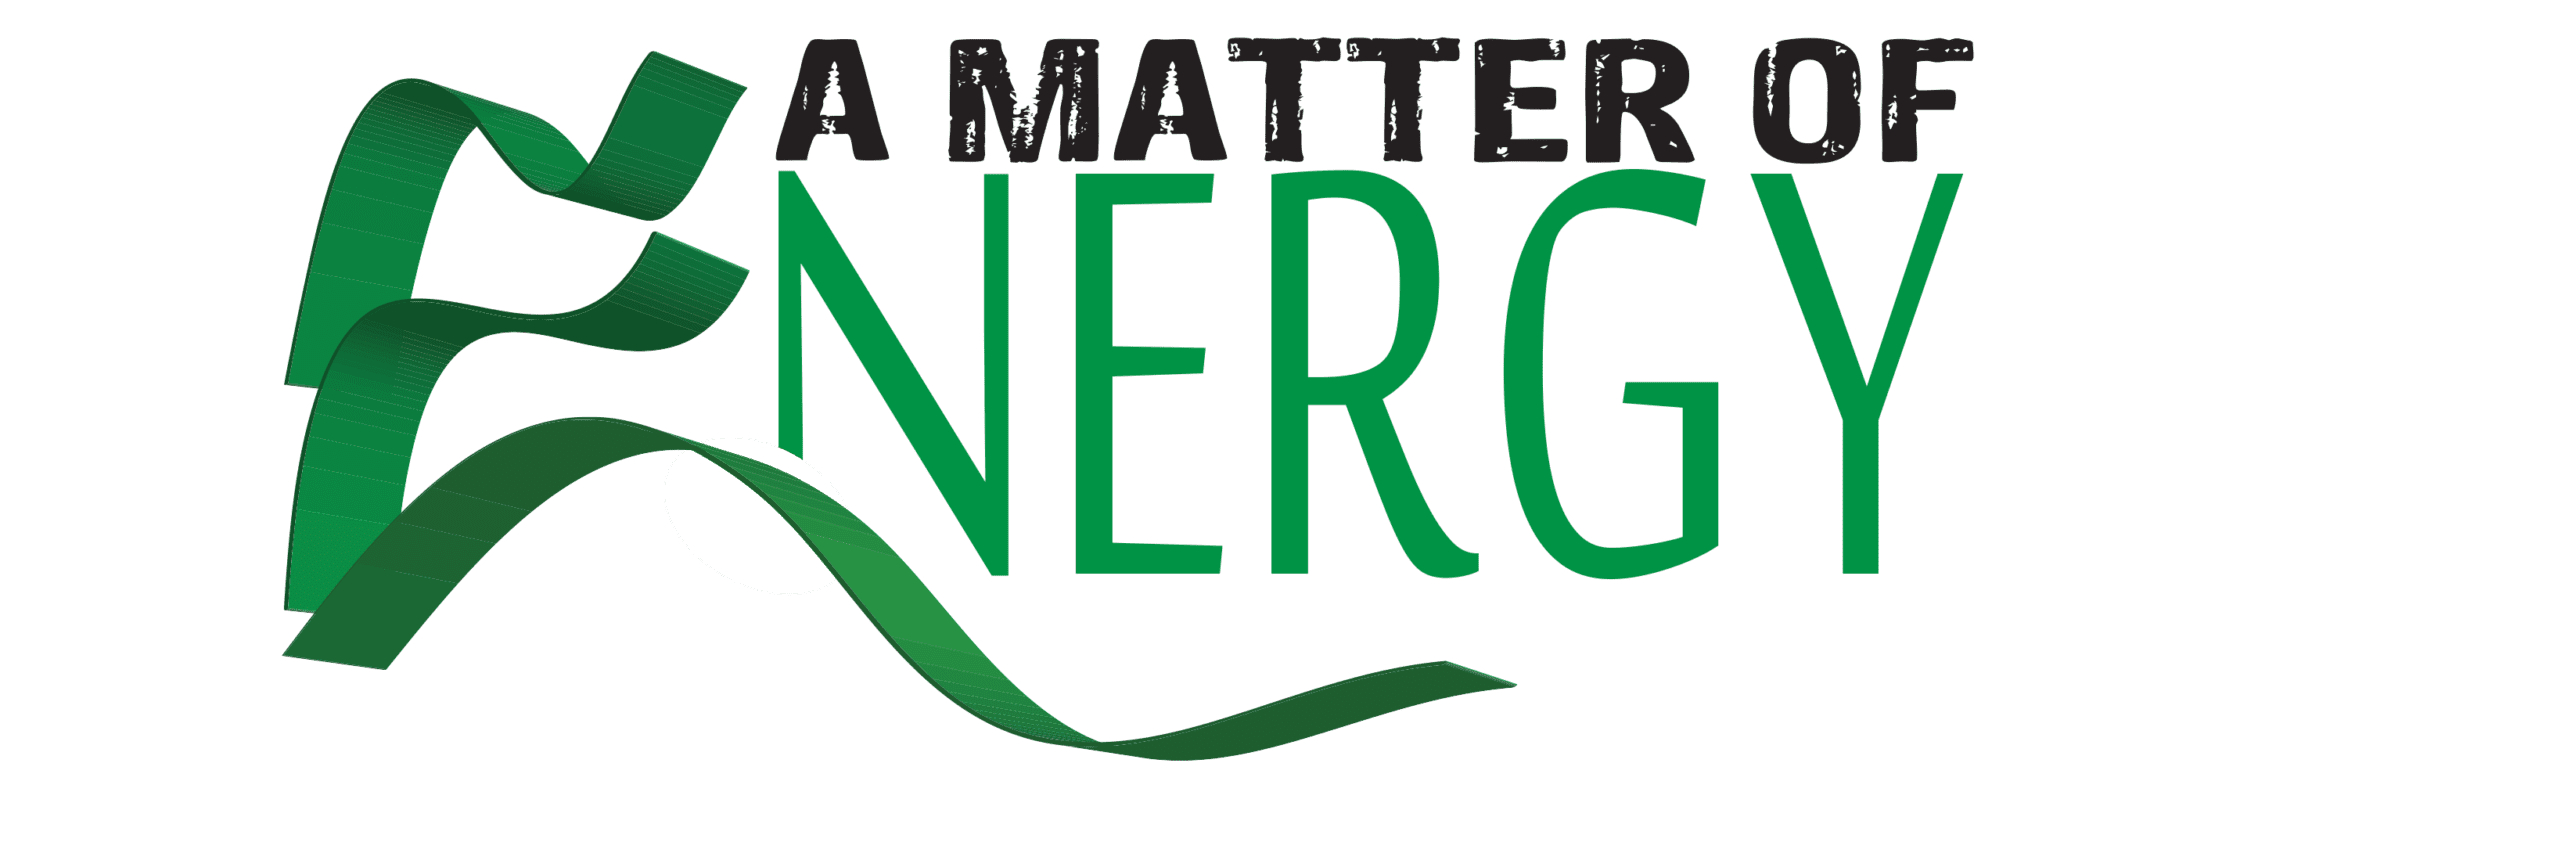 A Matter of Energy